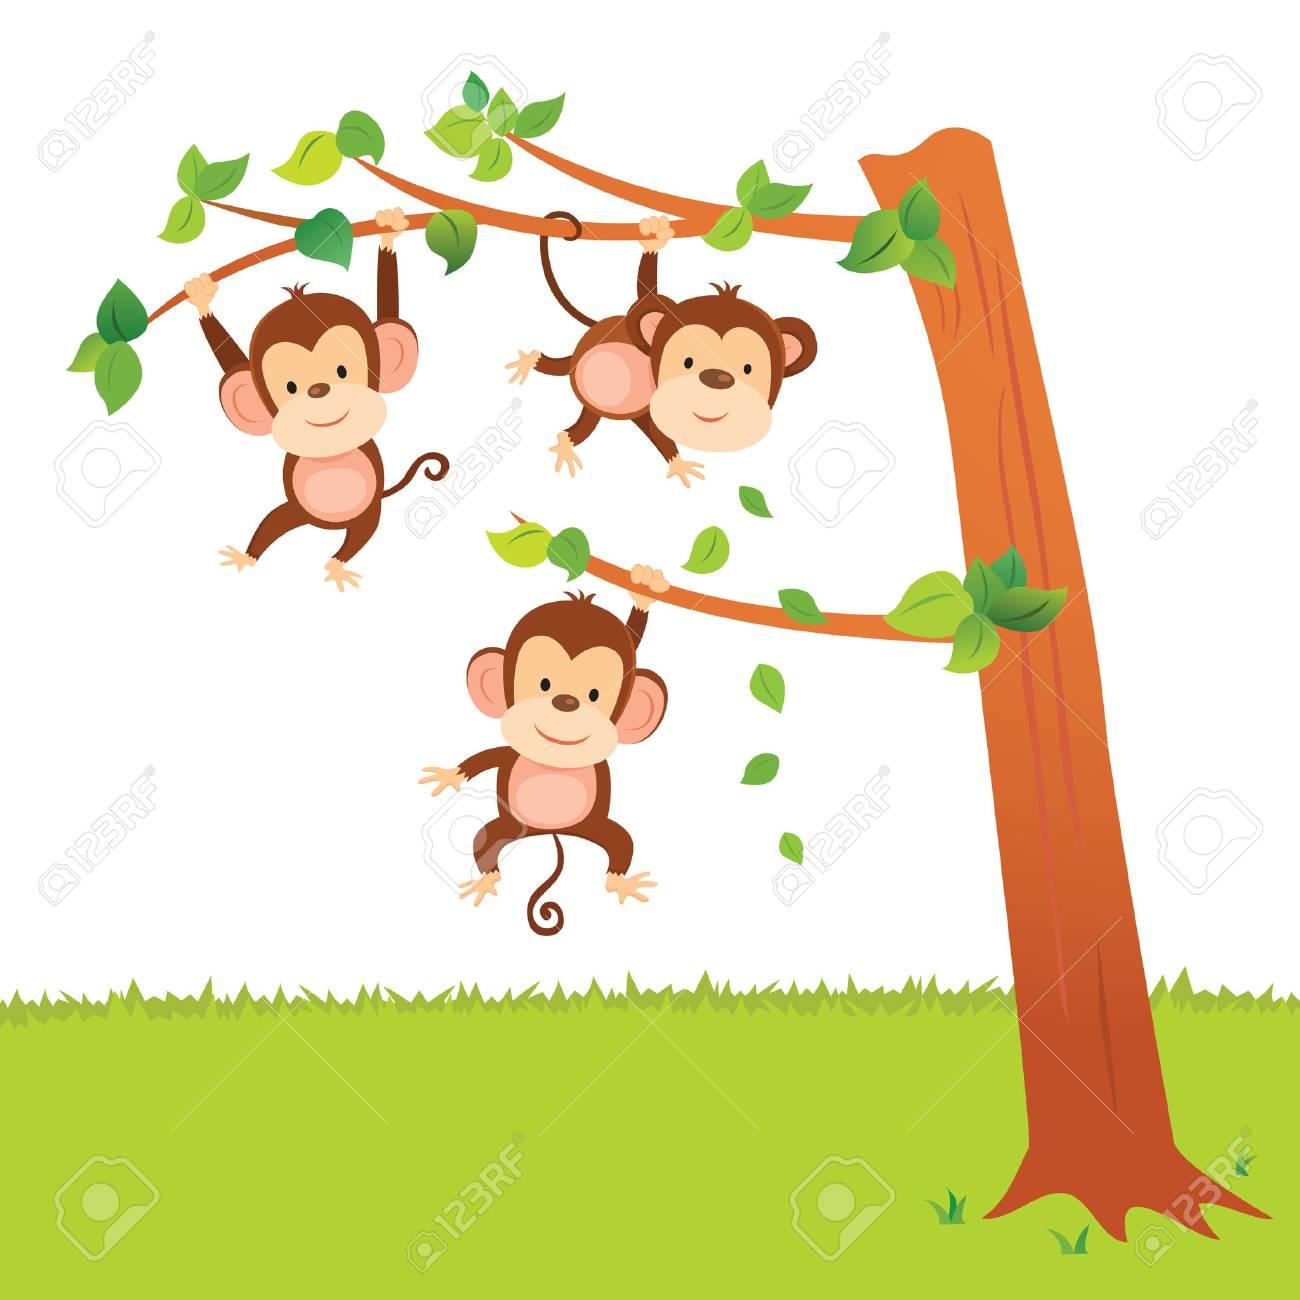 Monkeys Swinging In A Tree Have Fun Activities